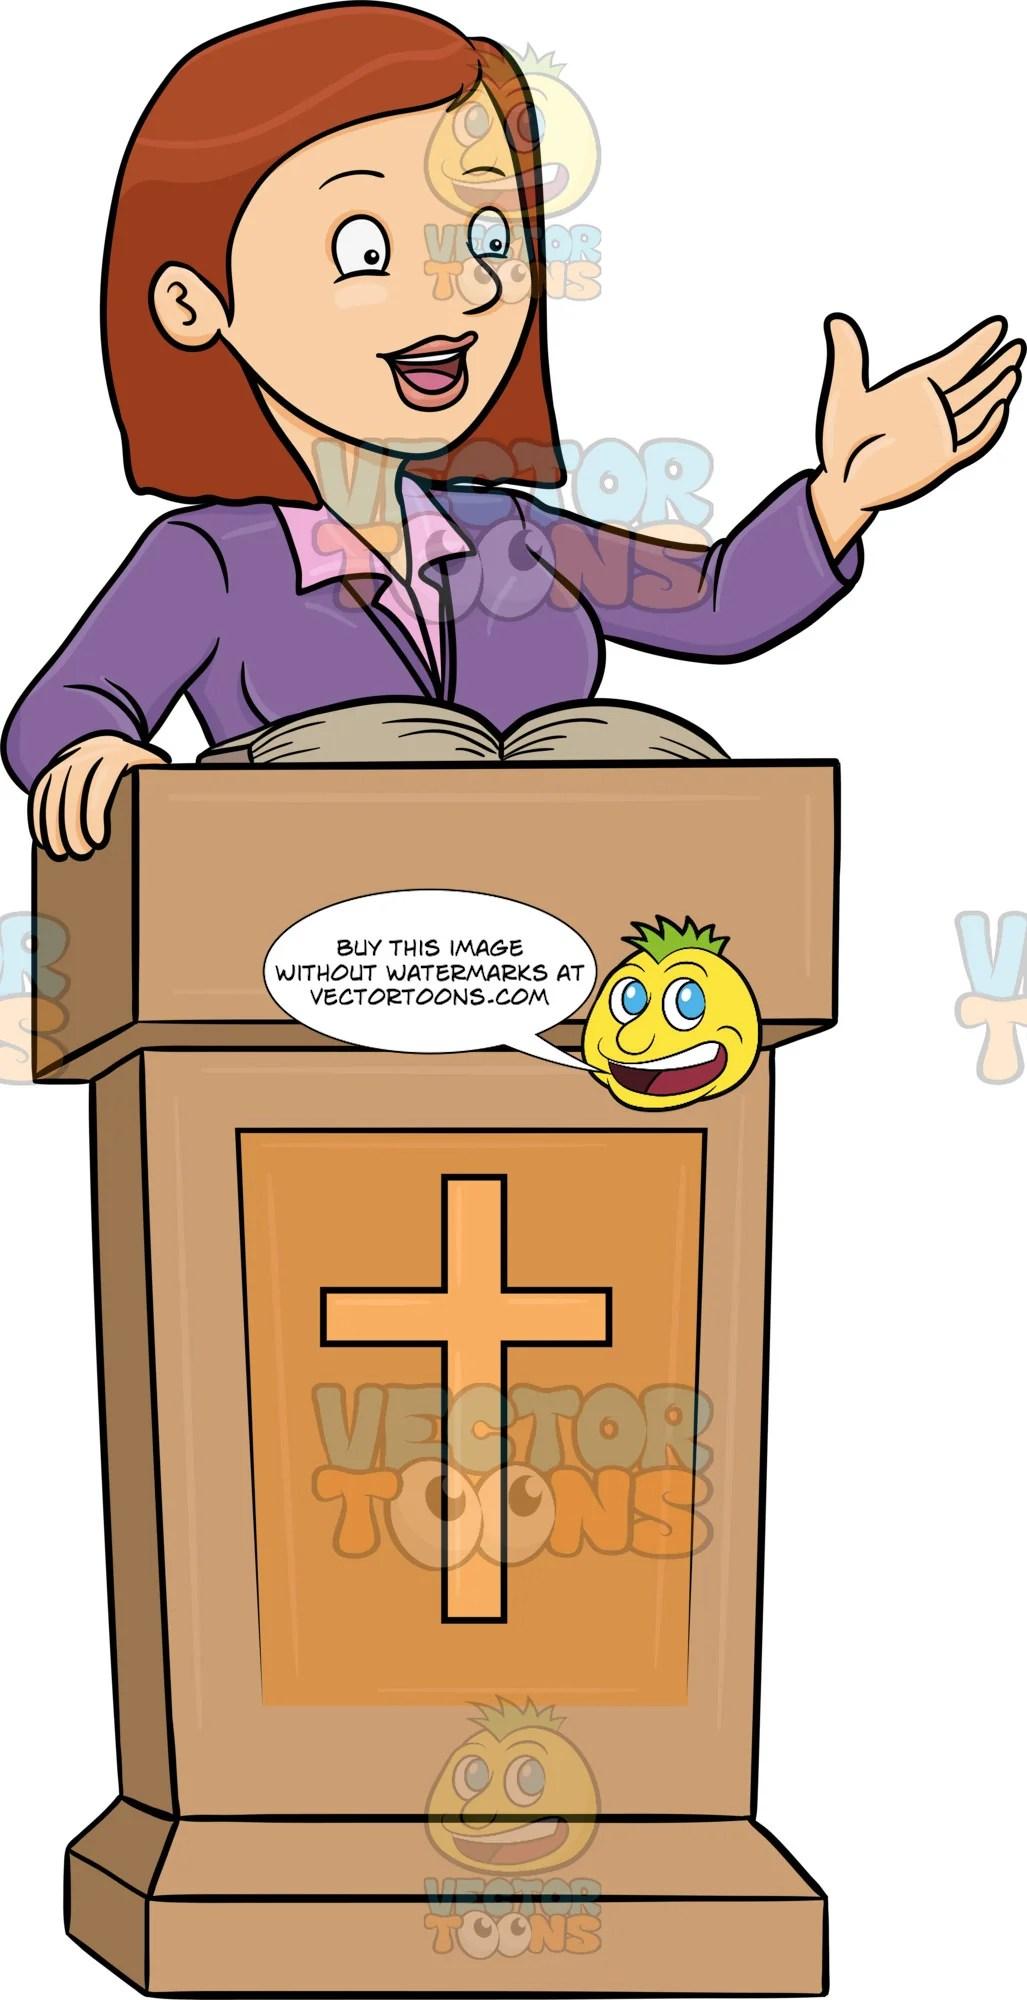 medium resolution of a female preacher telling the good news clipart cartoons by vectortoons